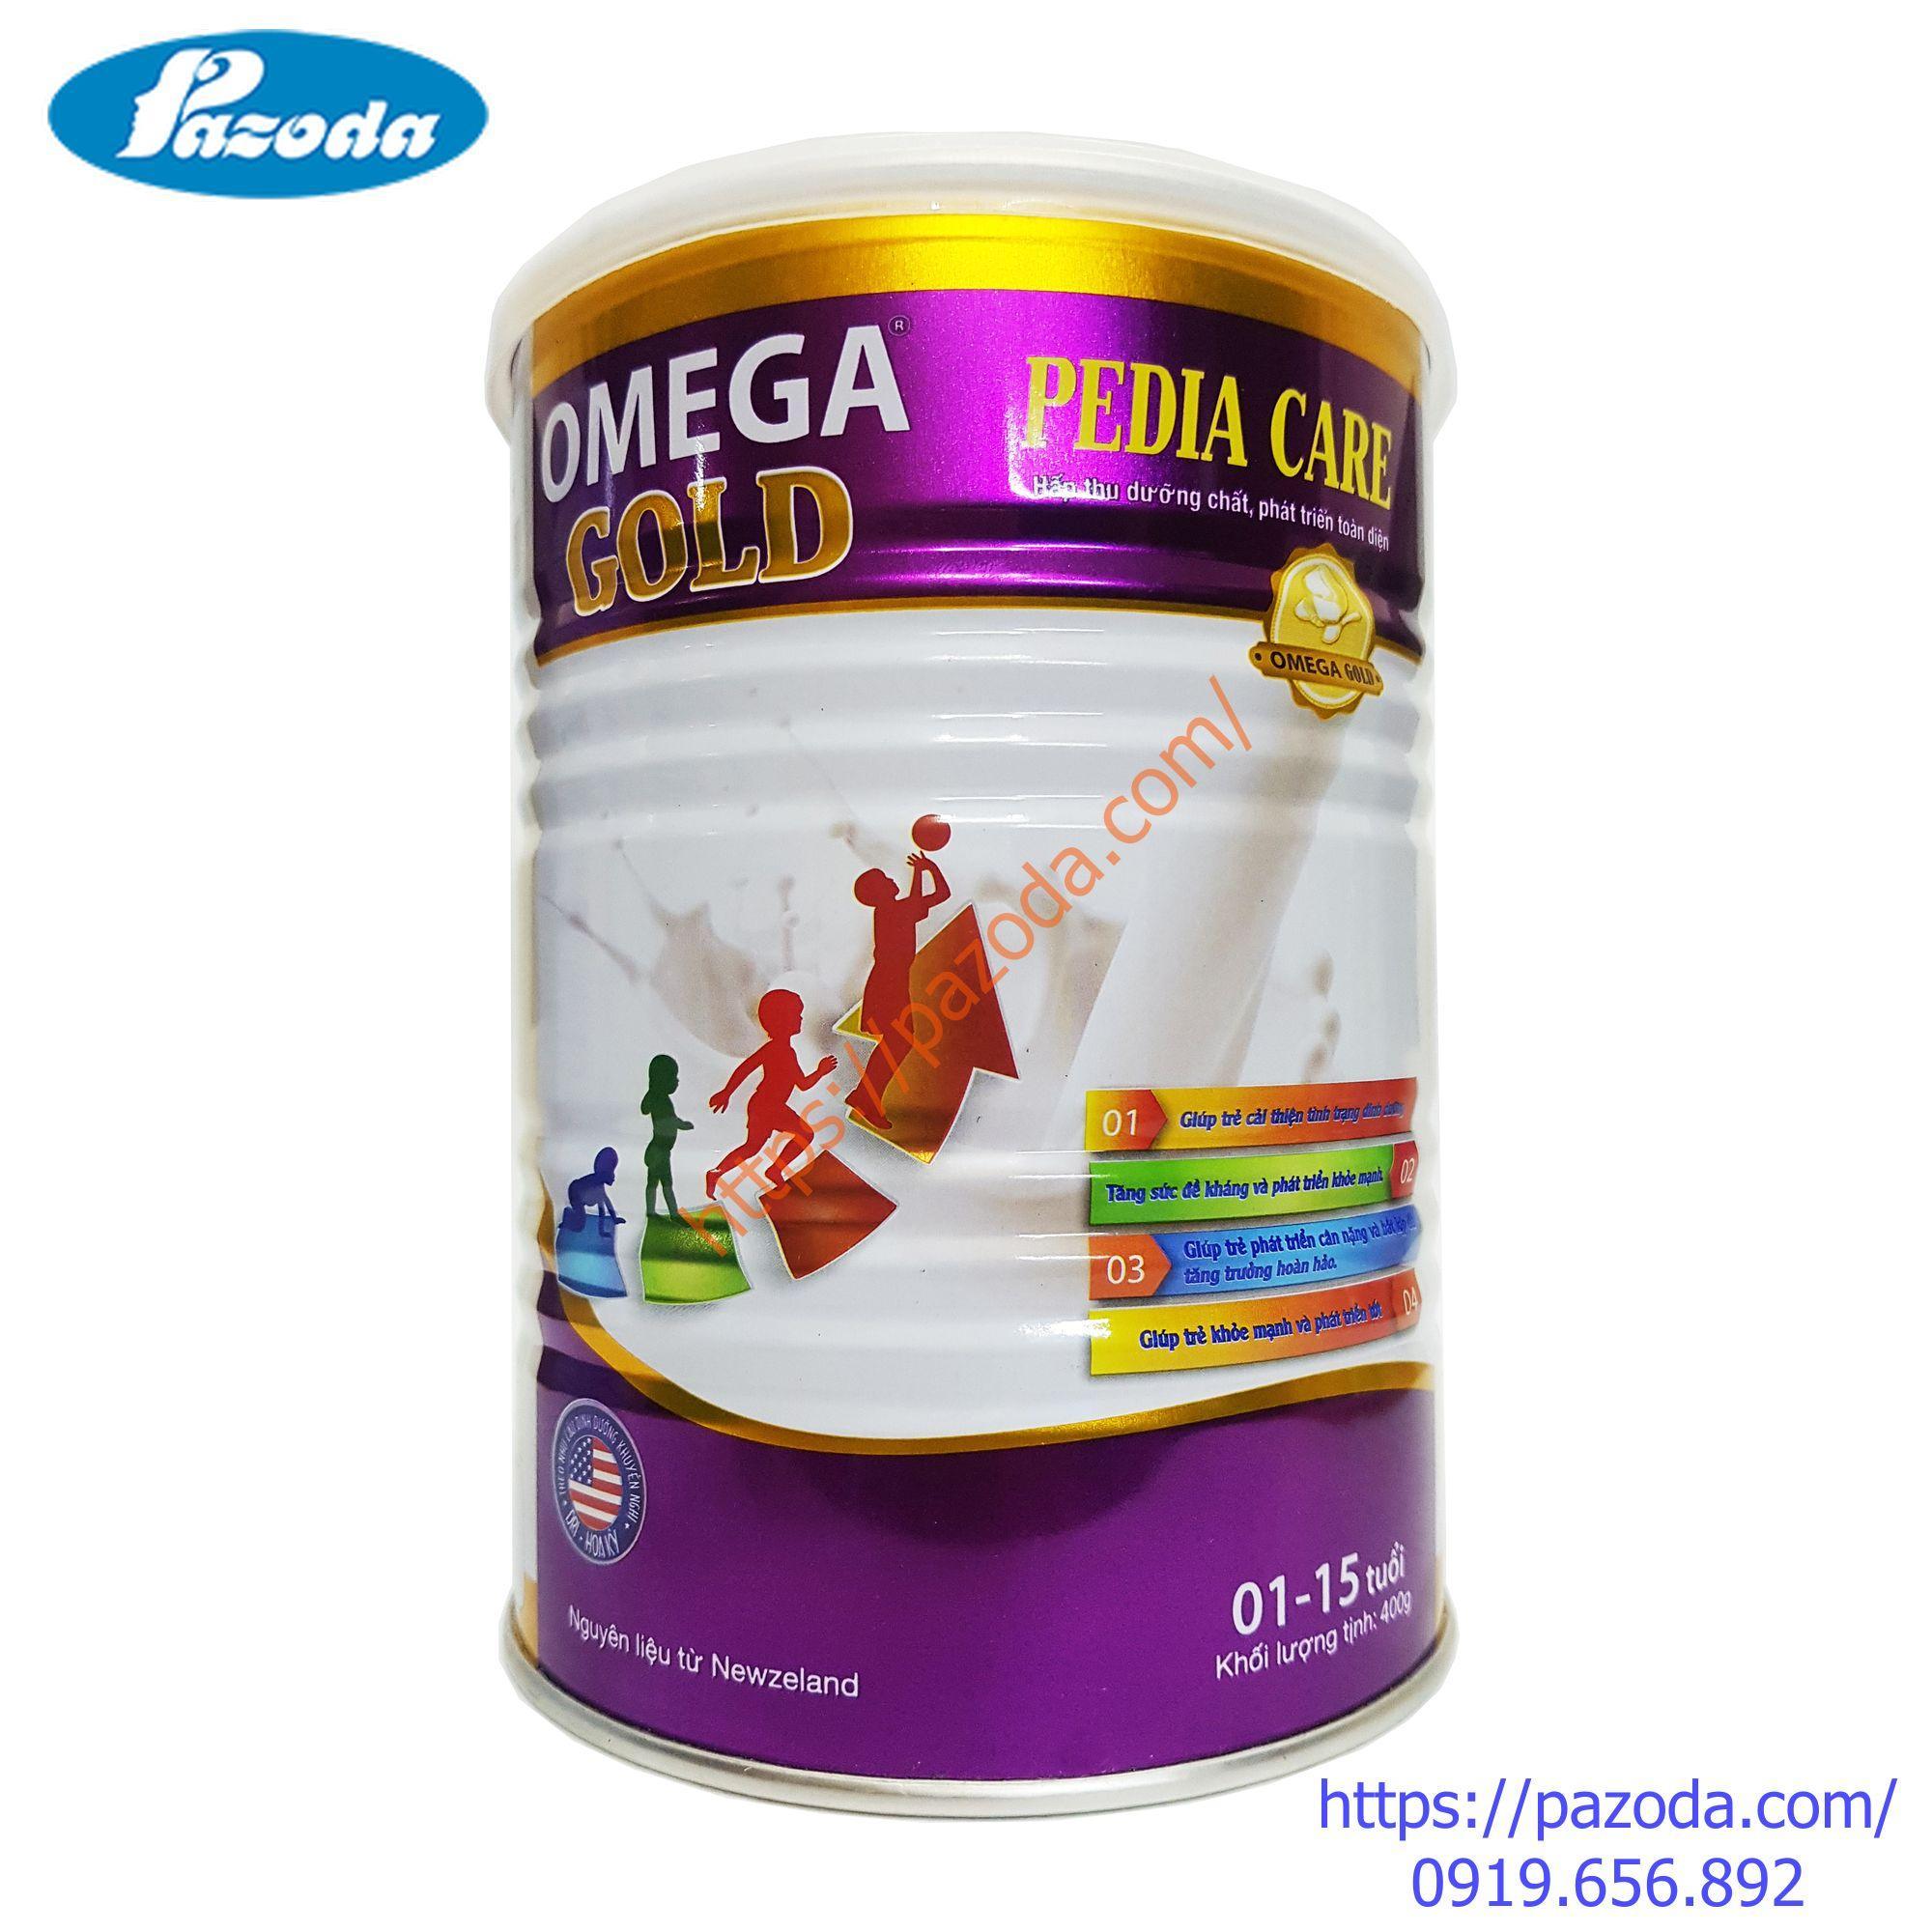 Sữa bột cho trẻ từ 1 đến 15 tuổi OMEGA GOLD Pedia Care 400g